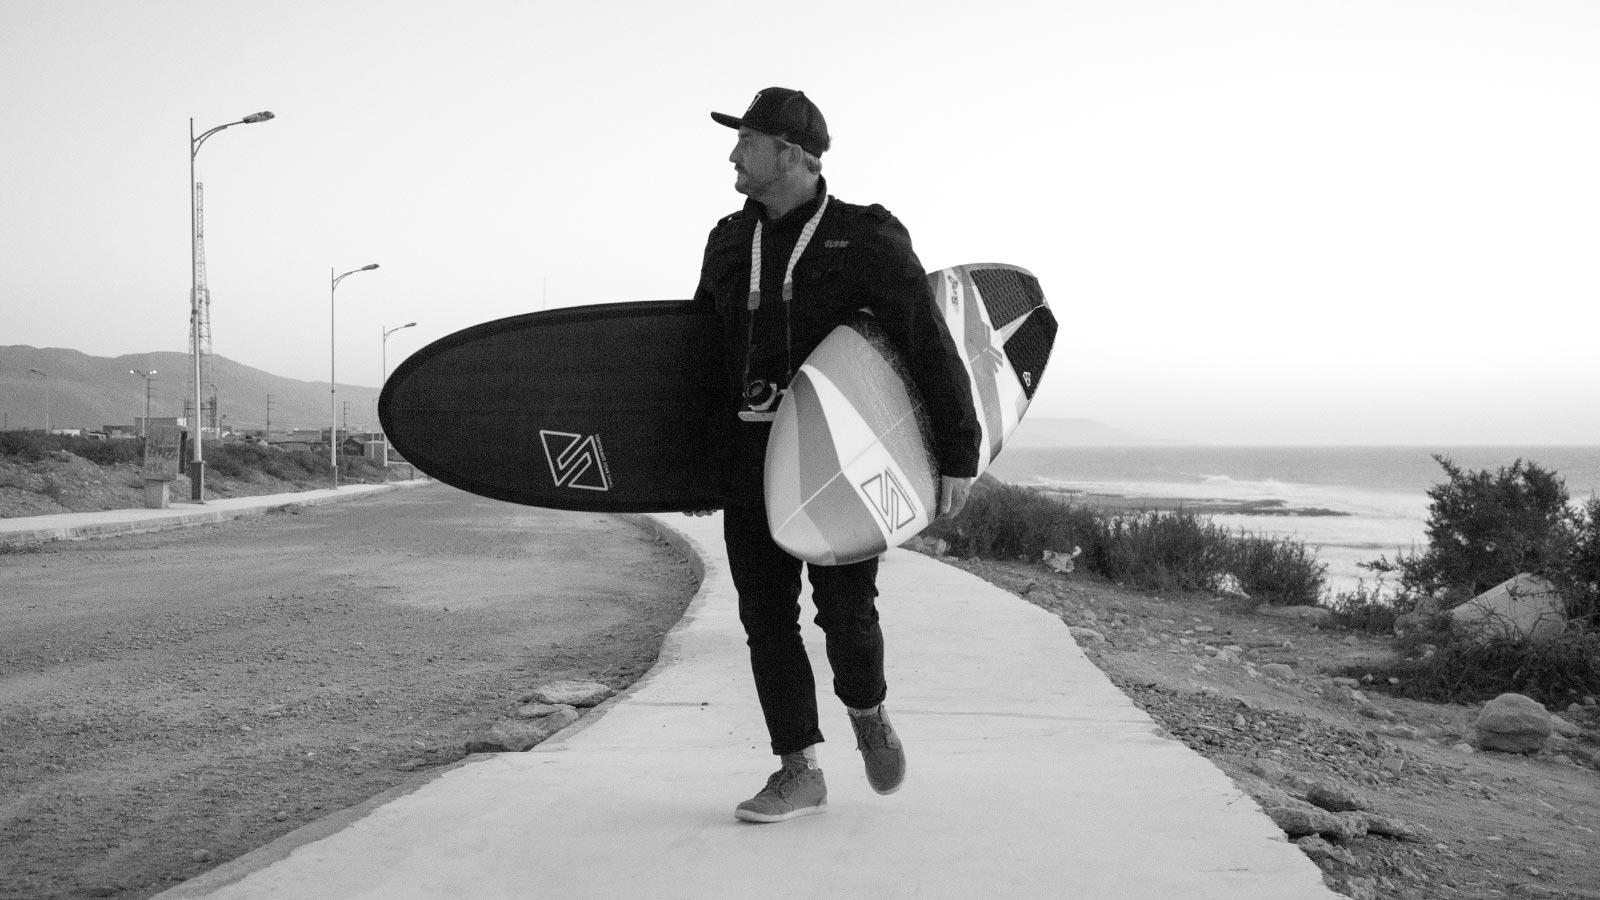 nicola-bresciani-twinsbros-surfboards